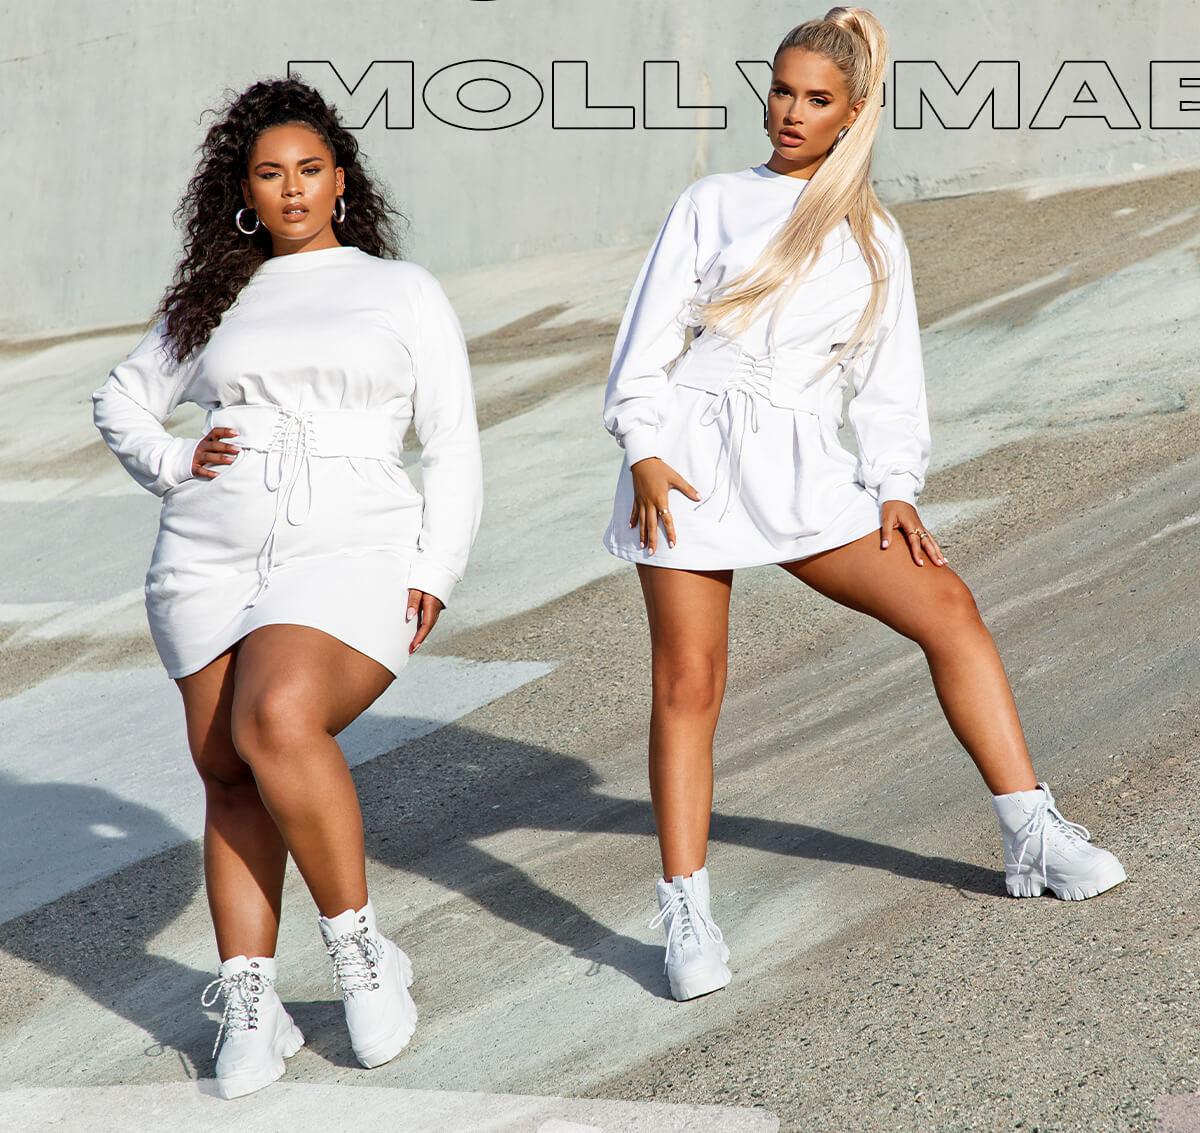 Molly Mae Lookbook Mobile Image 15